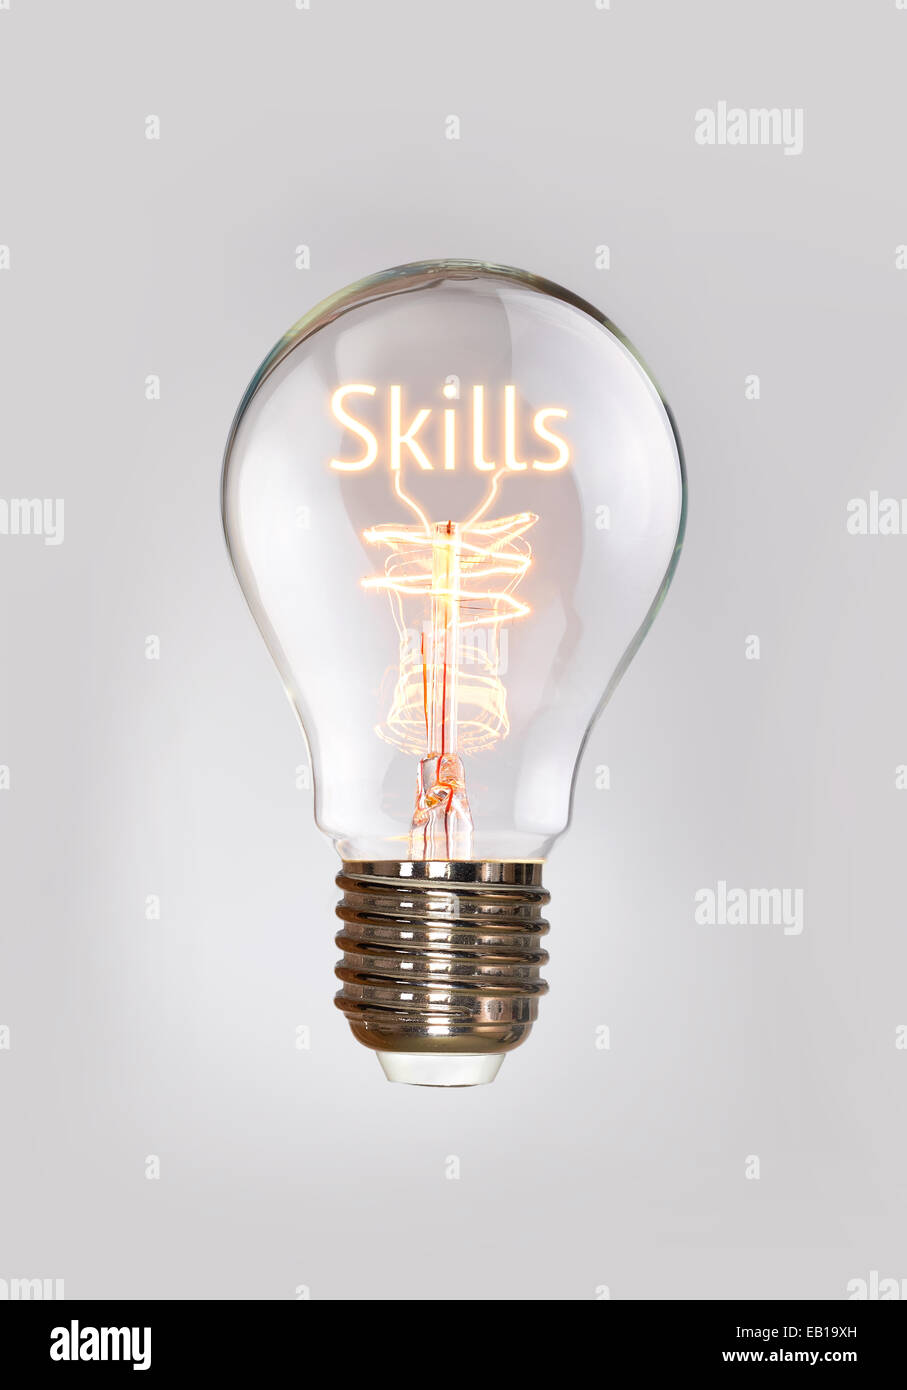 Skills-Konzept in ein Filament-Glühbirne. Stockbild